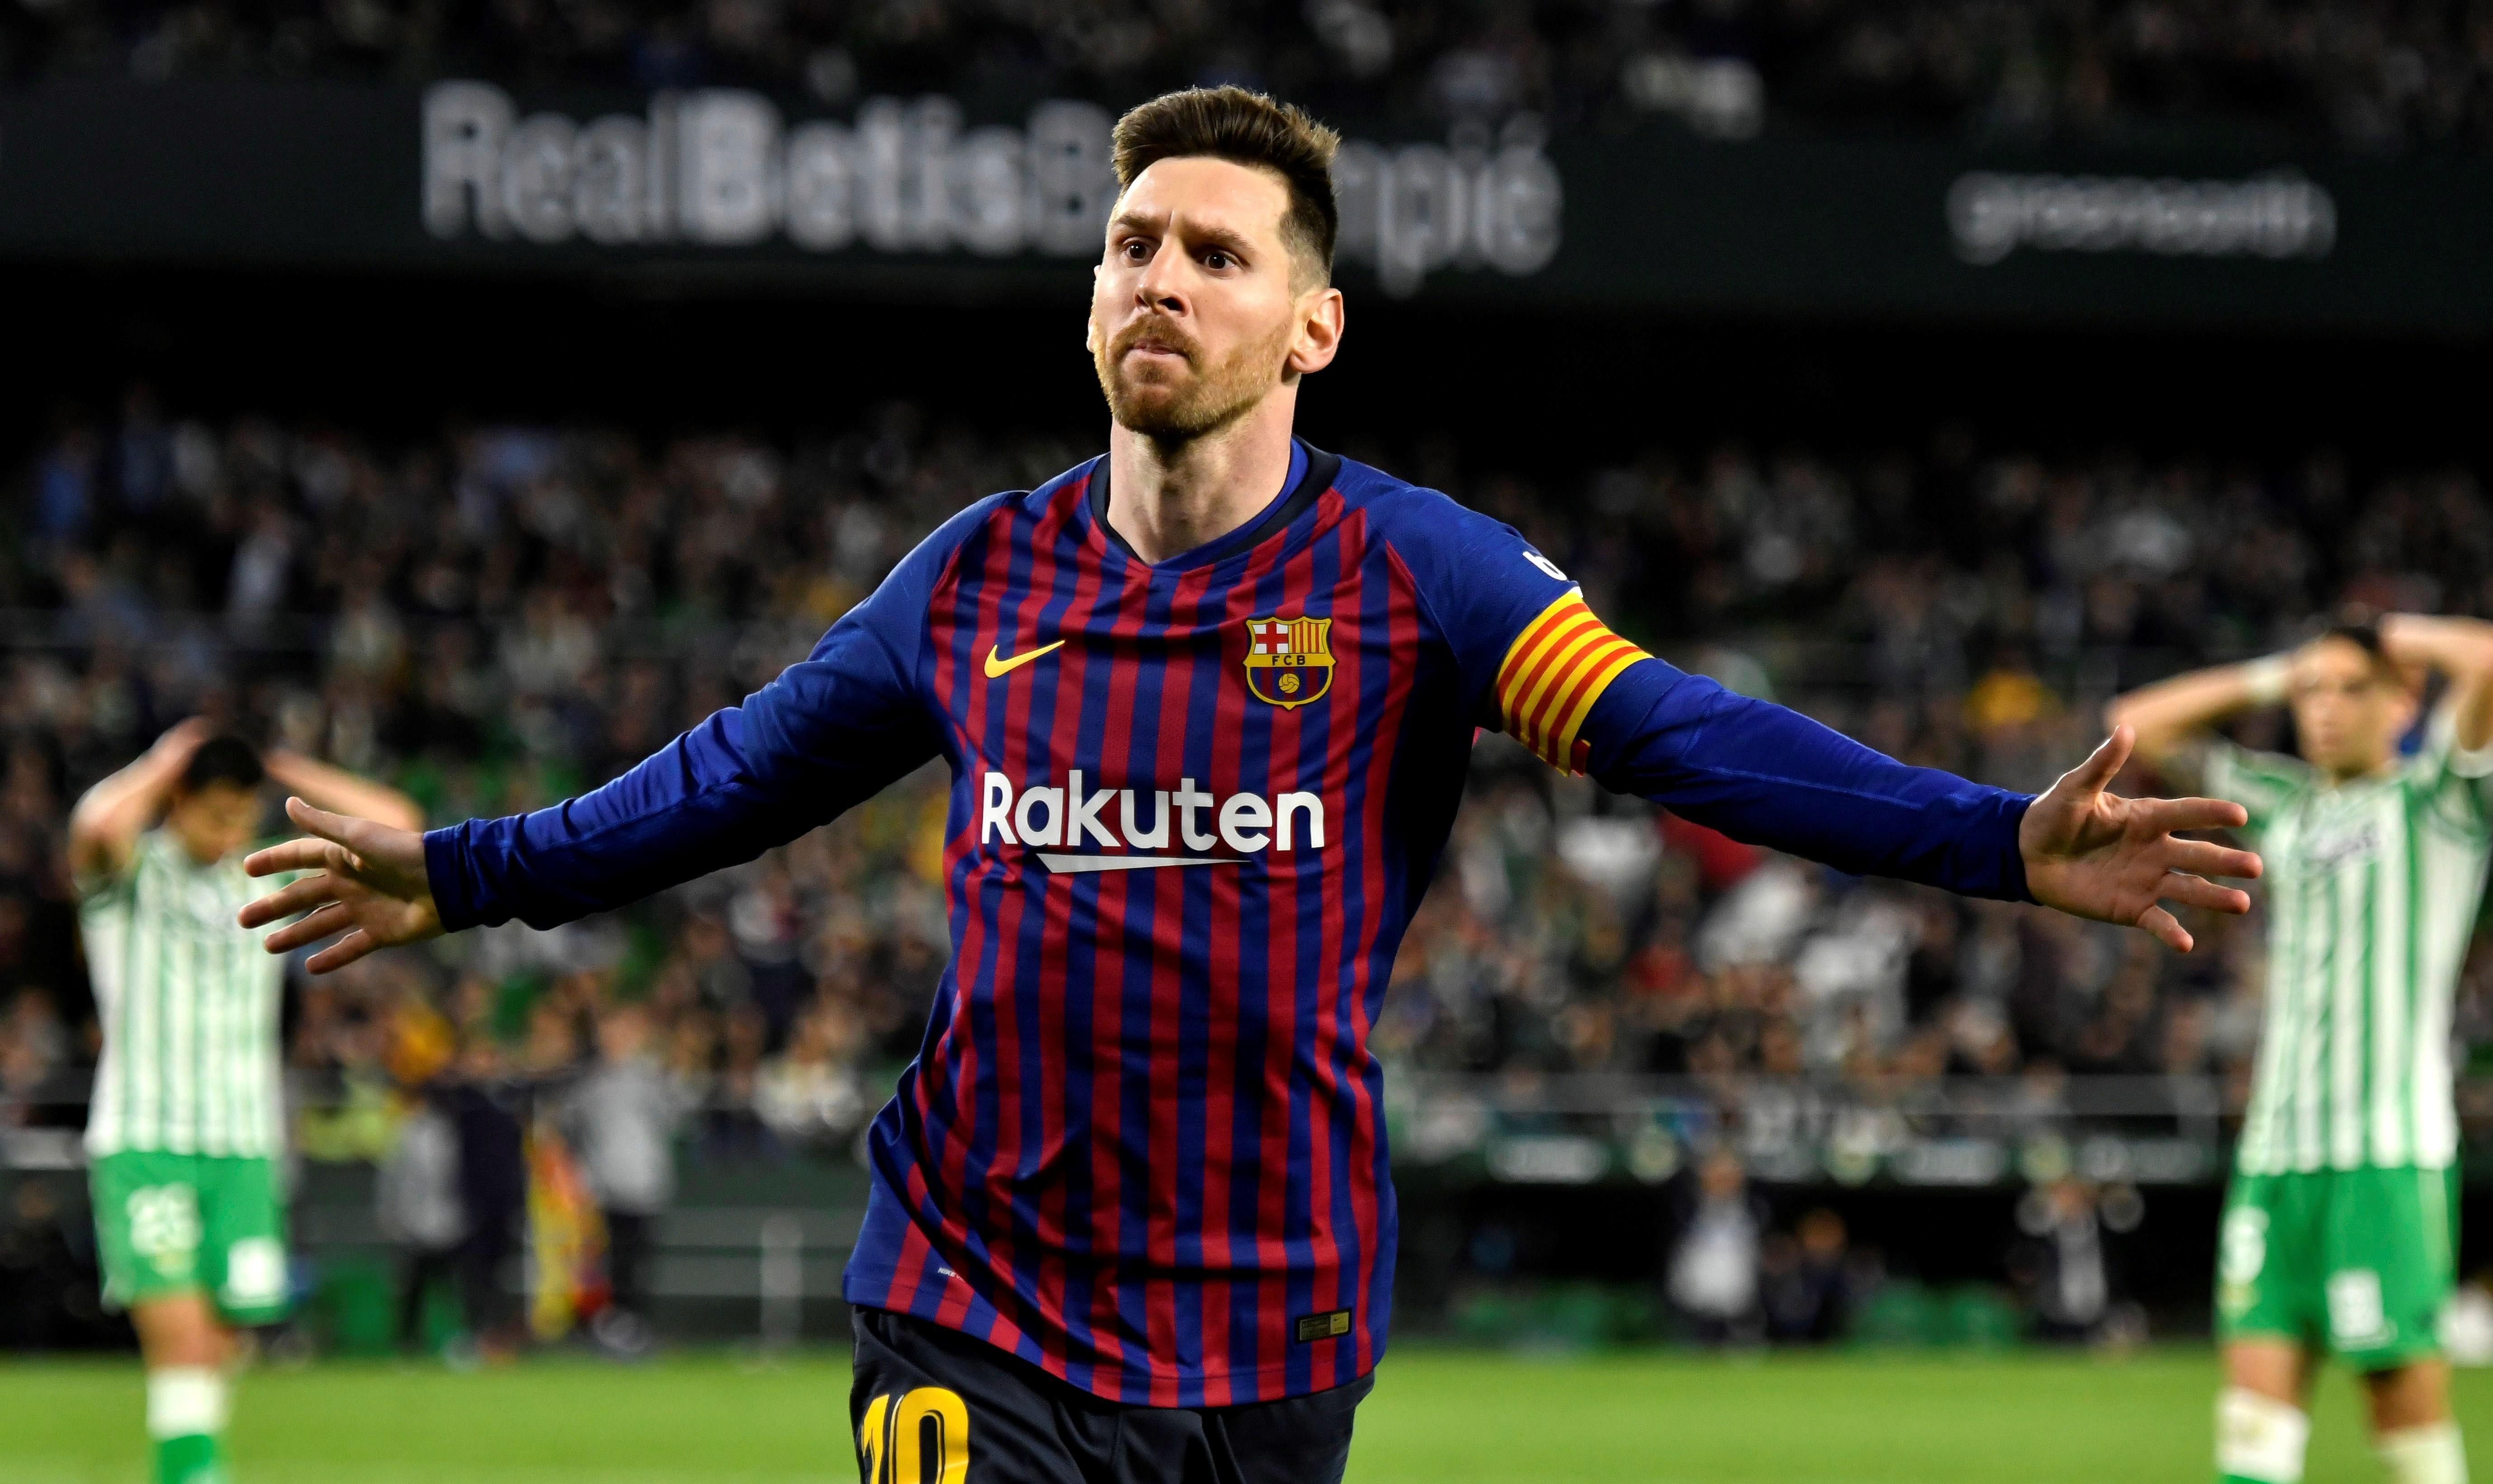 El delantero argentino del FC Barcelona, Leo Messi, celebra el cuarto gol del equipo blaugrana. (Foto Prensa Libre: EFE)